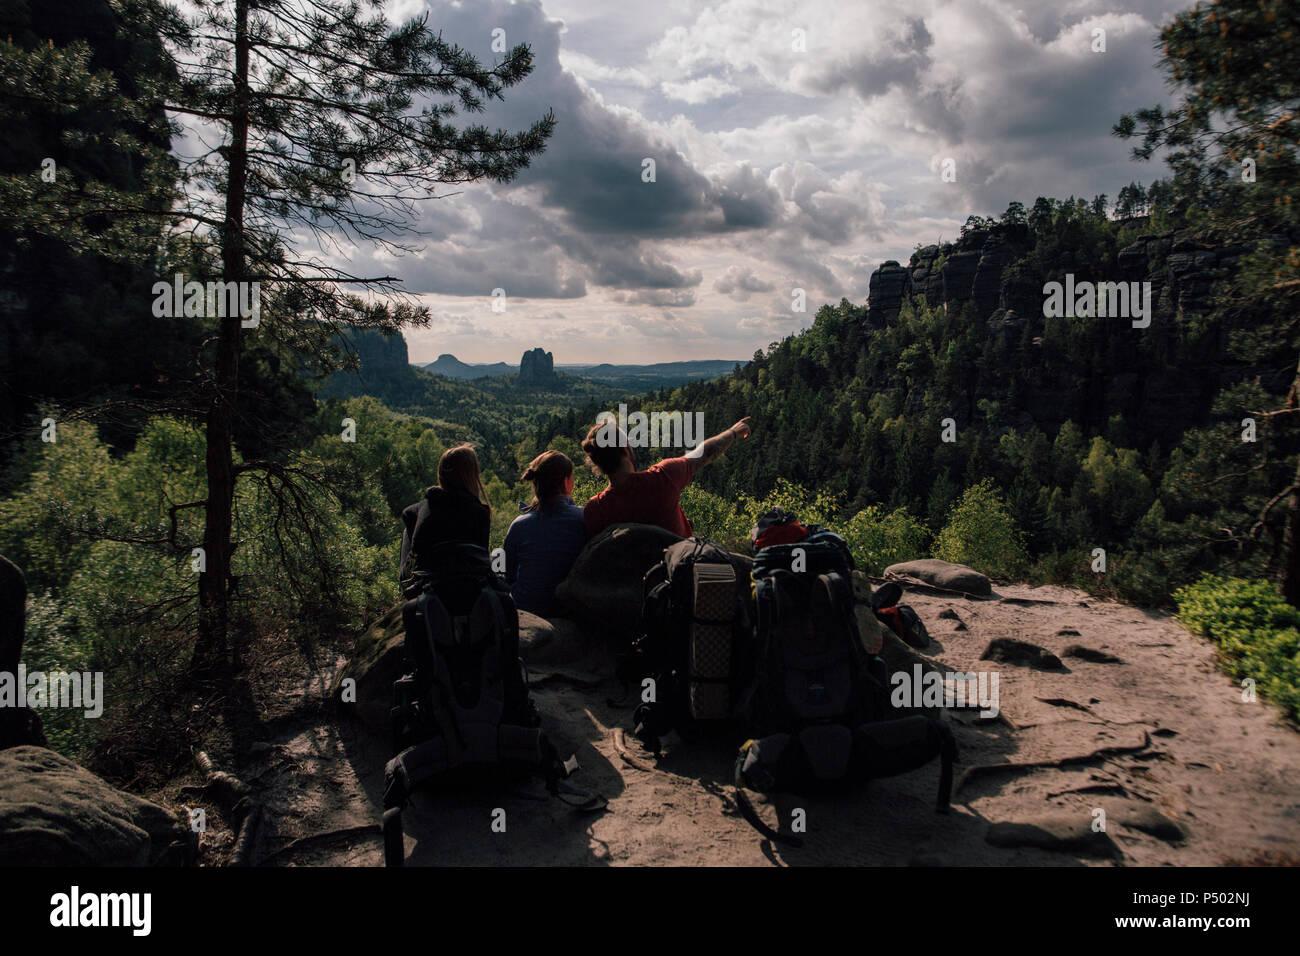 Germany, Saxony, Elbe Sandstone Mountains, friends on a hiking trip having a break - Stock Image